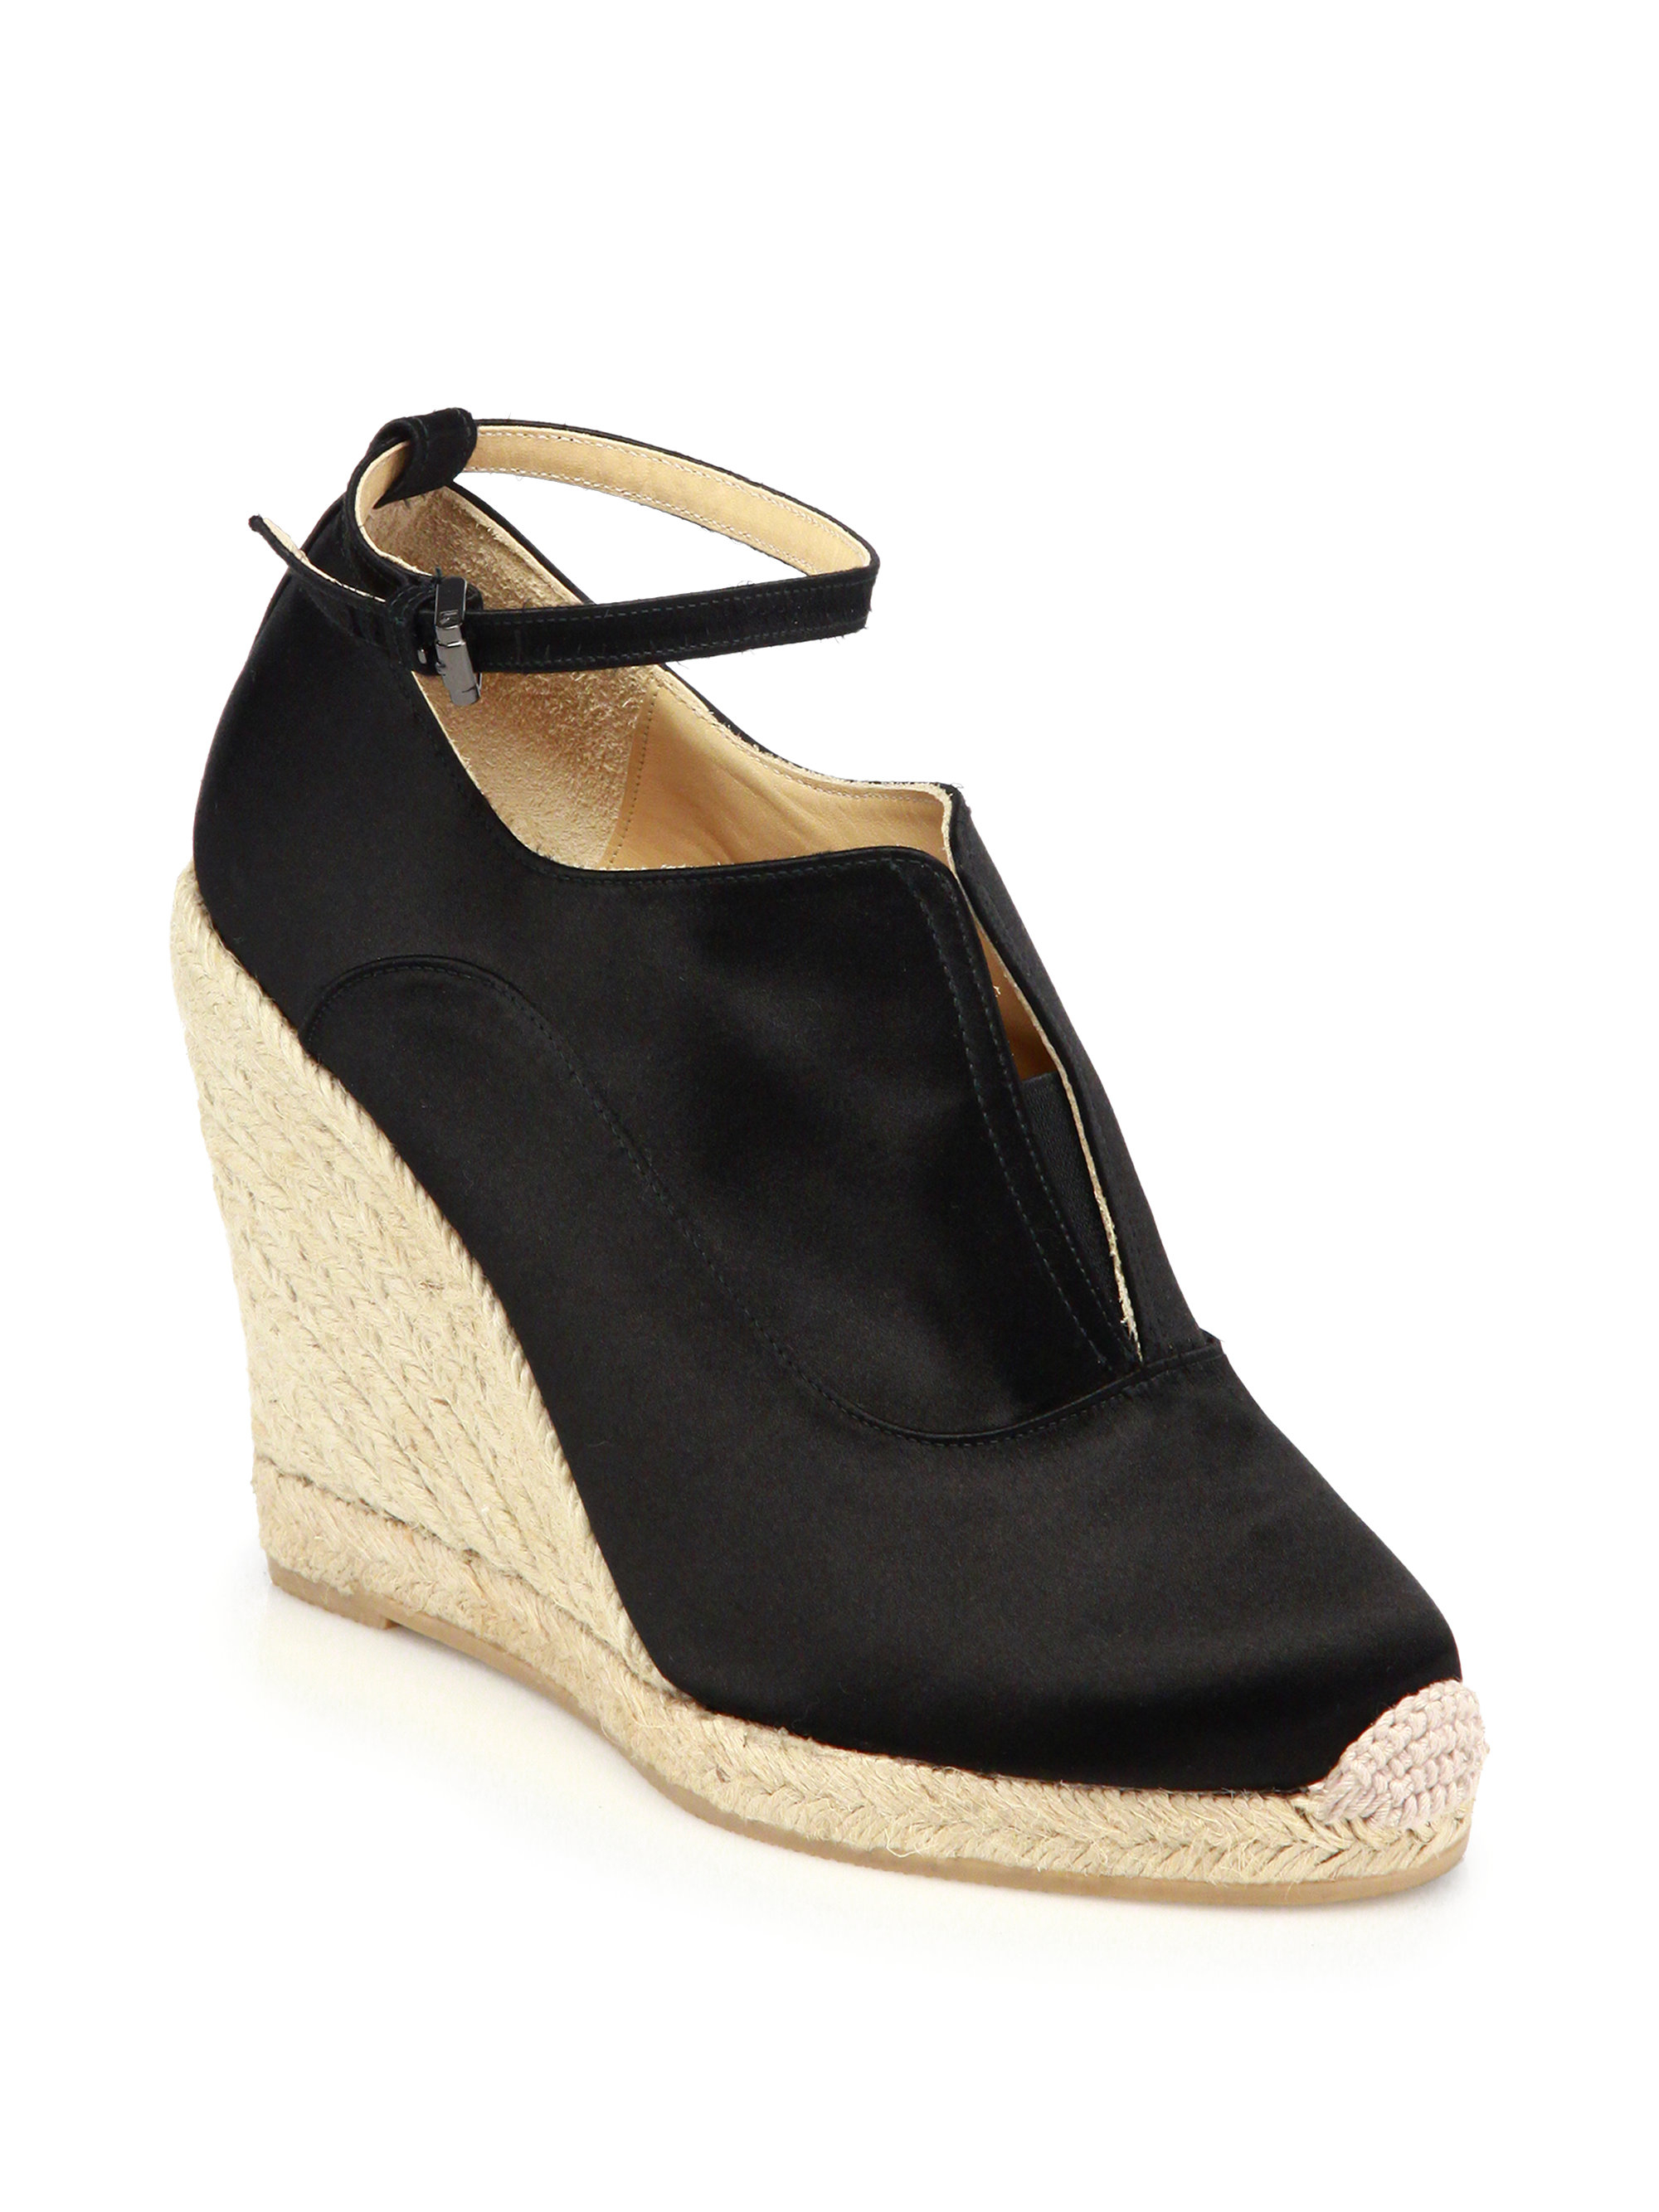 reed krakoff satin espadrille wedge sandals in black lyst